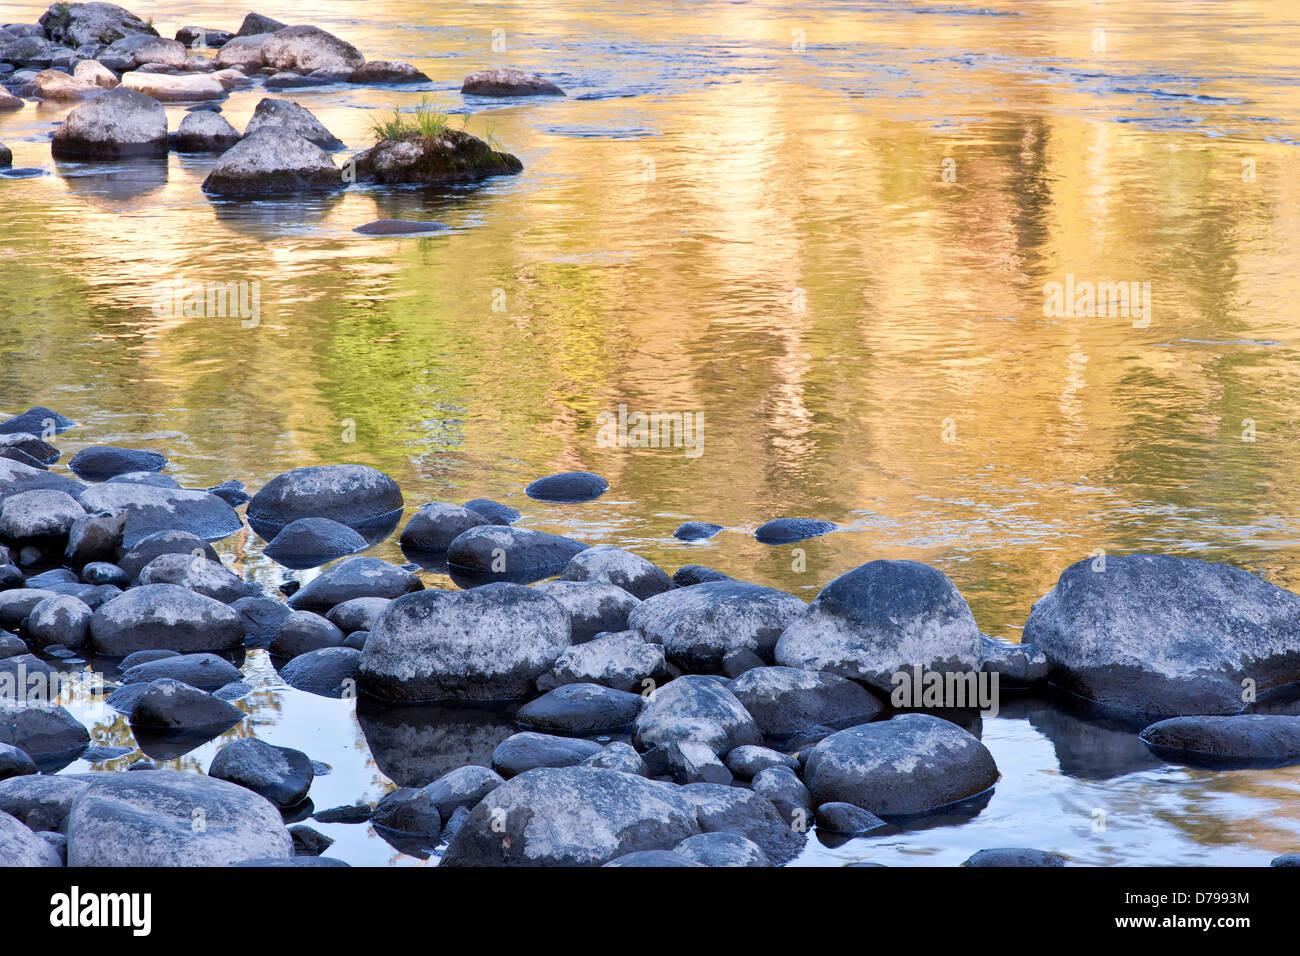 Herbst Überlegungen, Clackamas Fluss. Stockbild